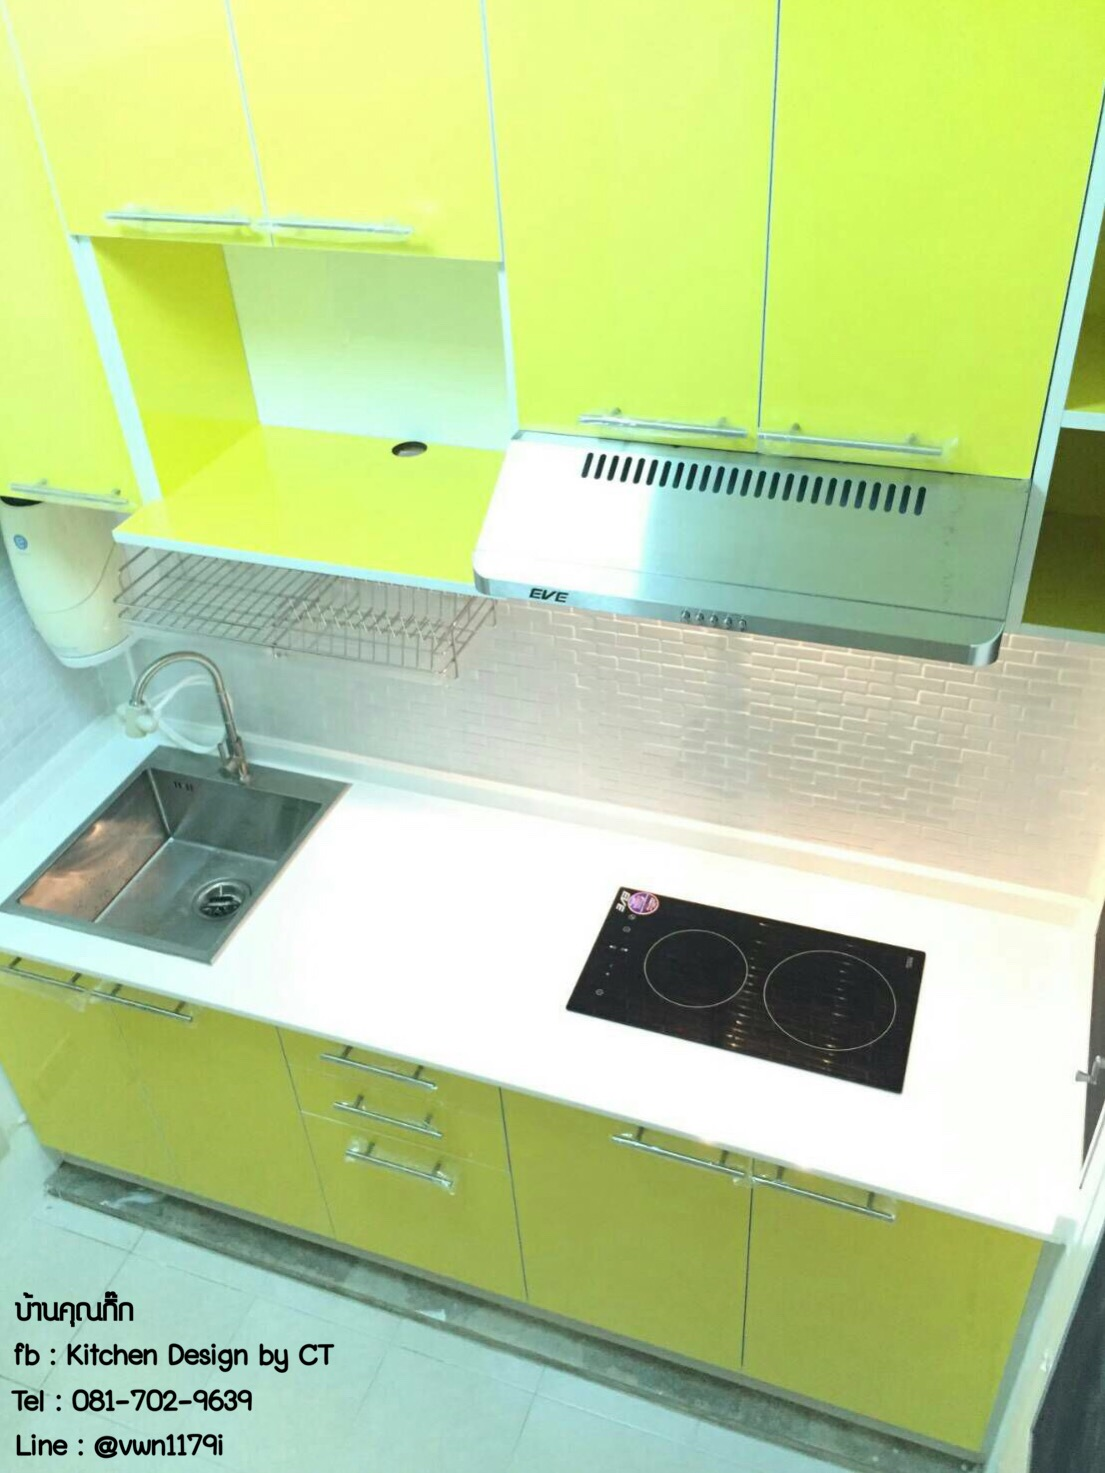 Yellow Lemon Kitchen (ครัวบิ้วอินสีเหลืองสไตล์โมเดิร์น)